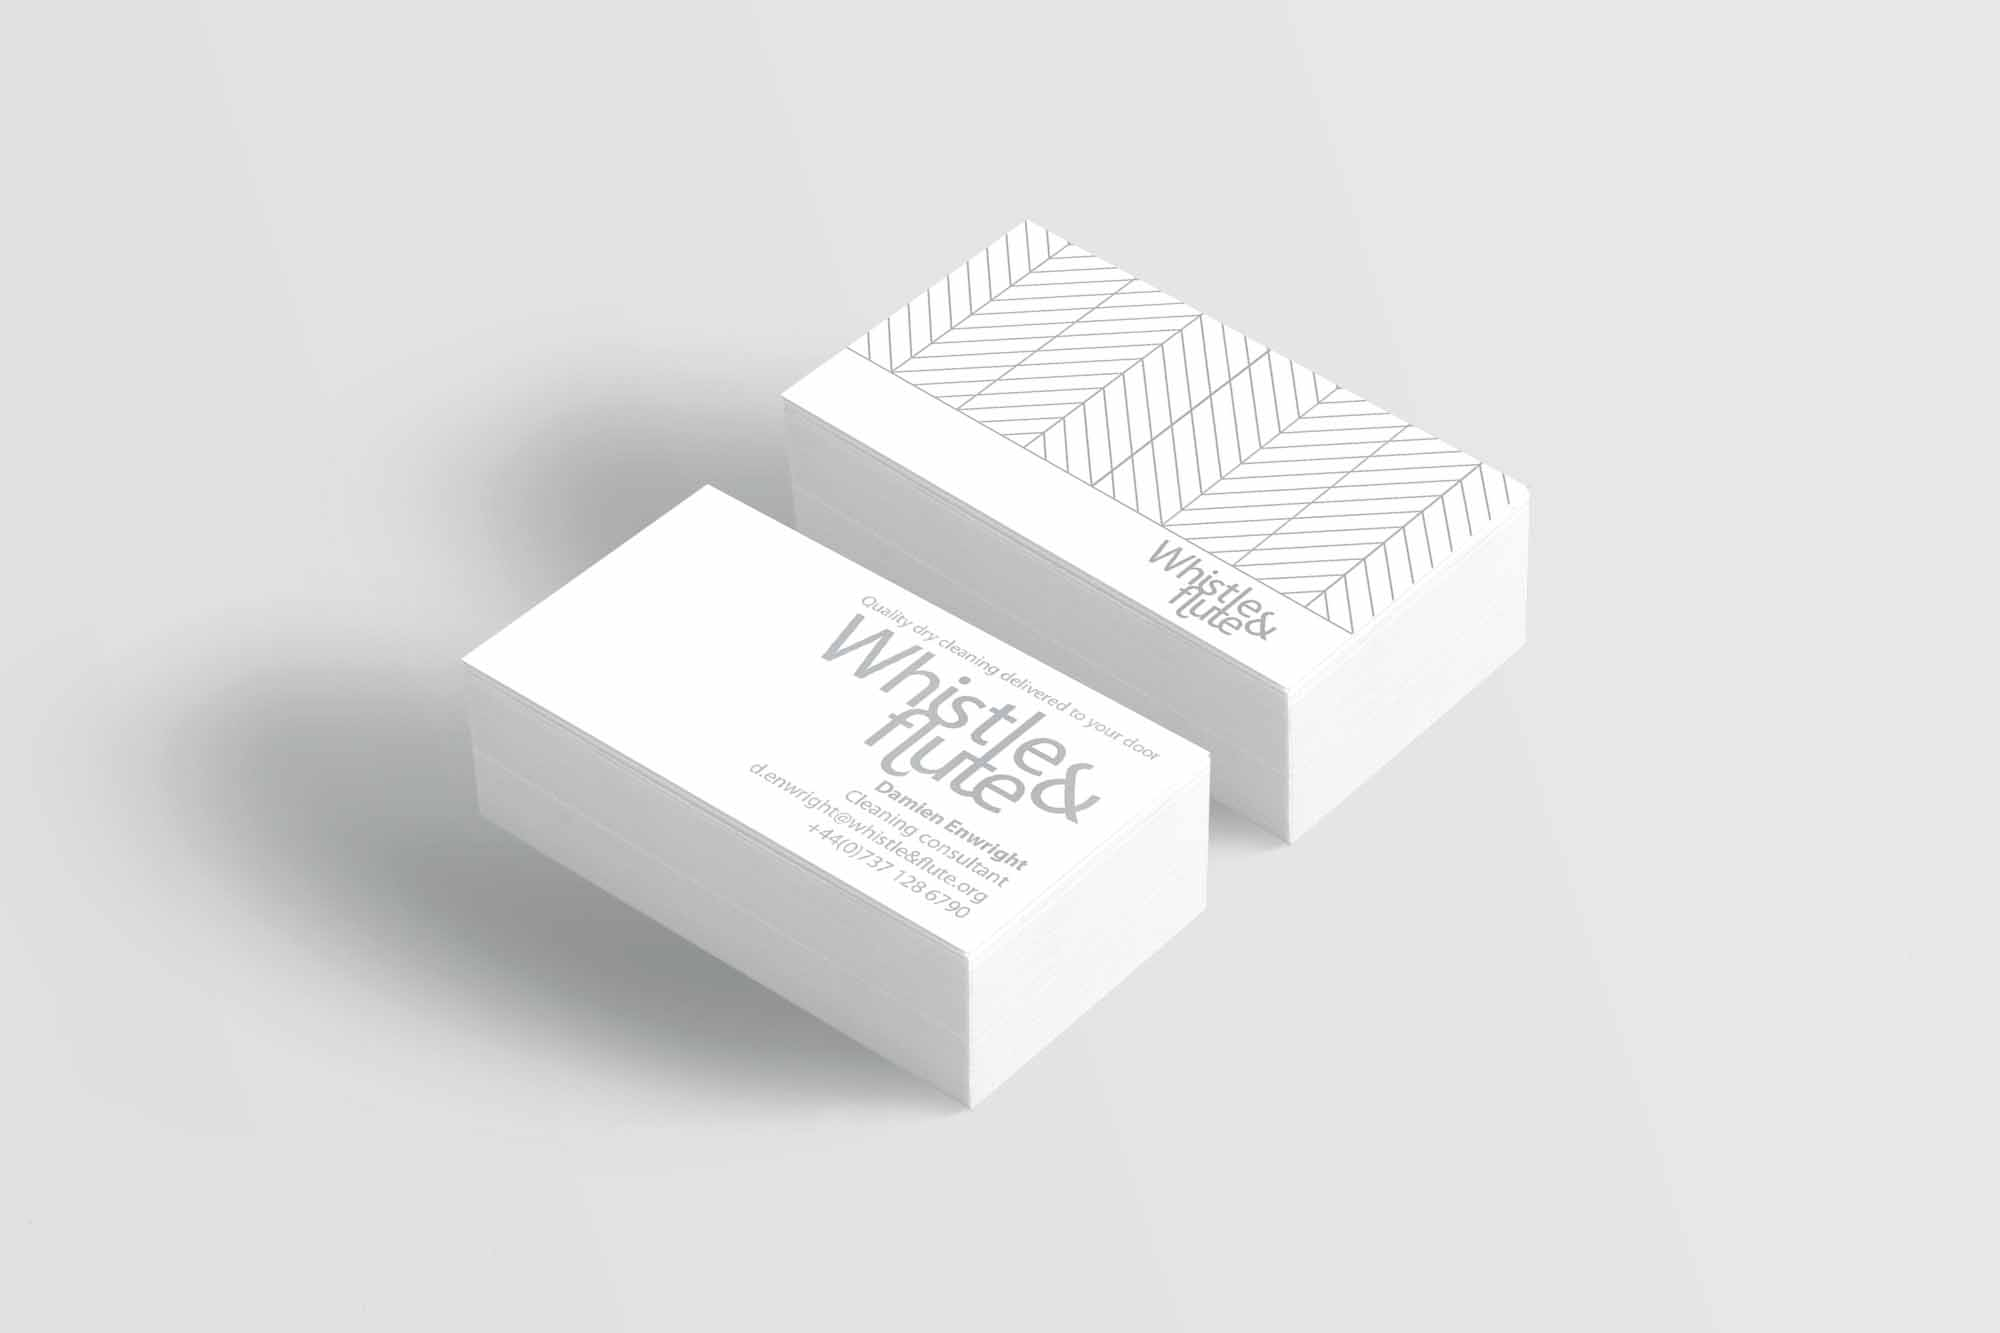 whistle-card.jpg